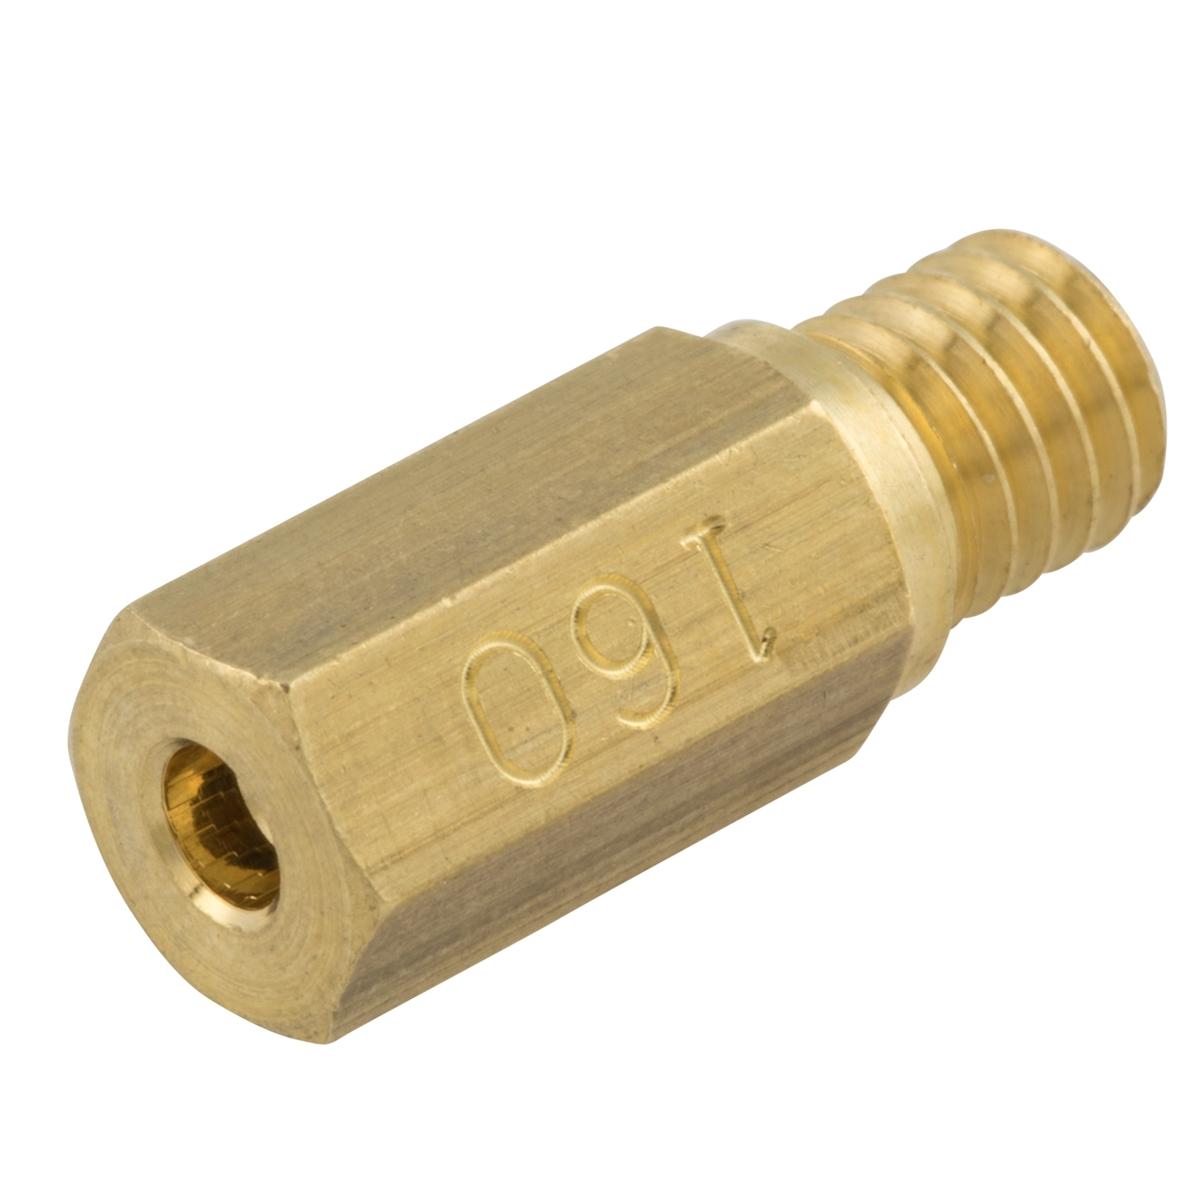 Zdjęcie produktu dla 'Dysza KMT 168 Ø 6 mmTitle'